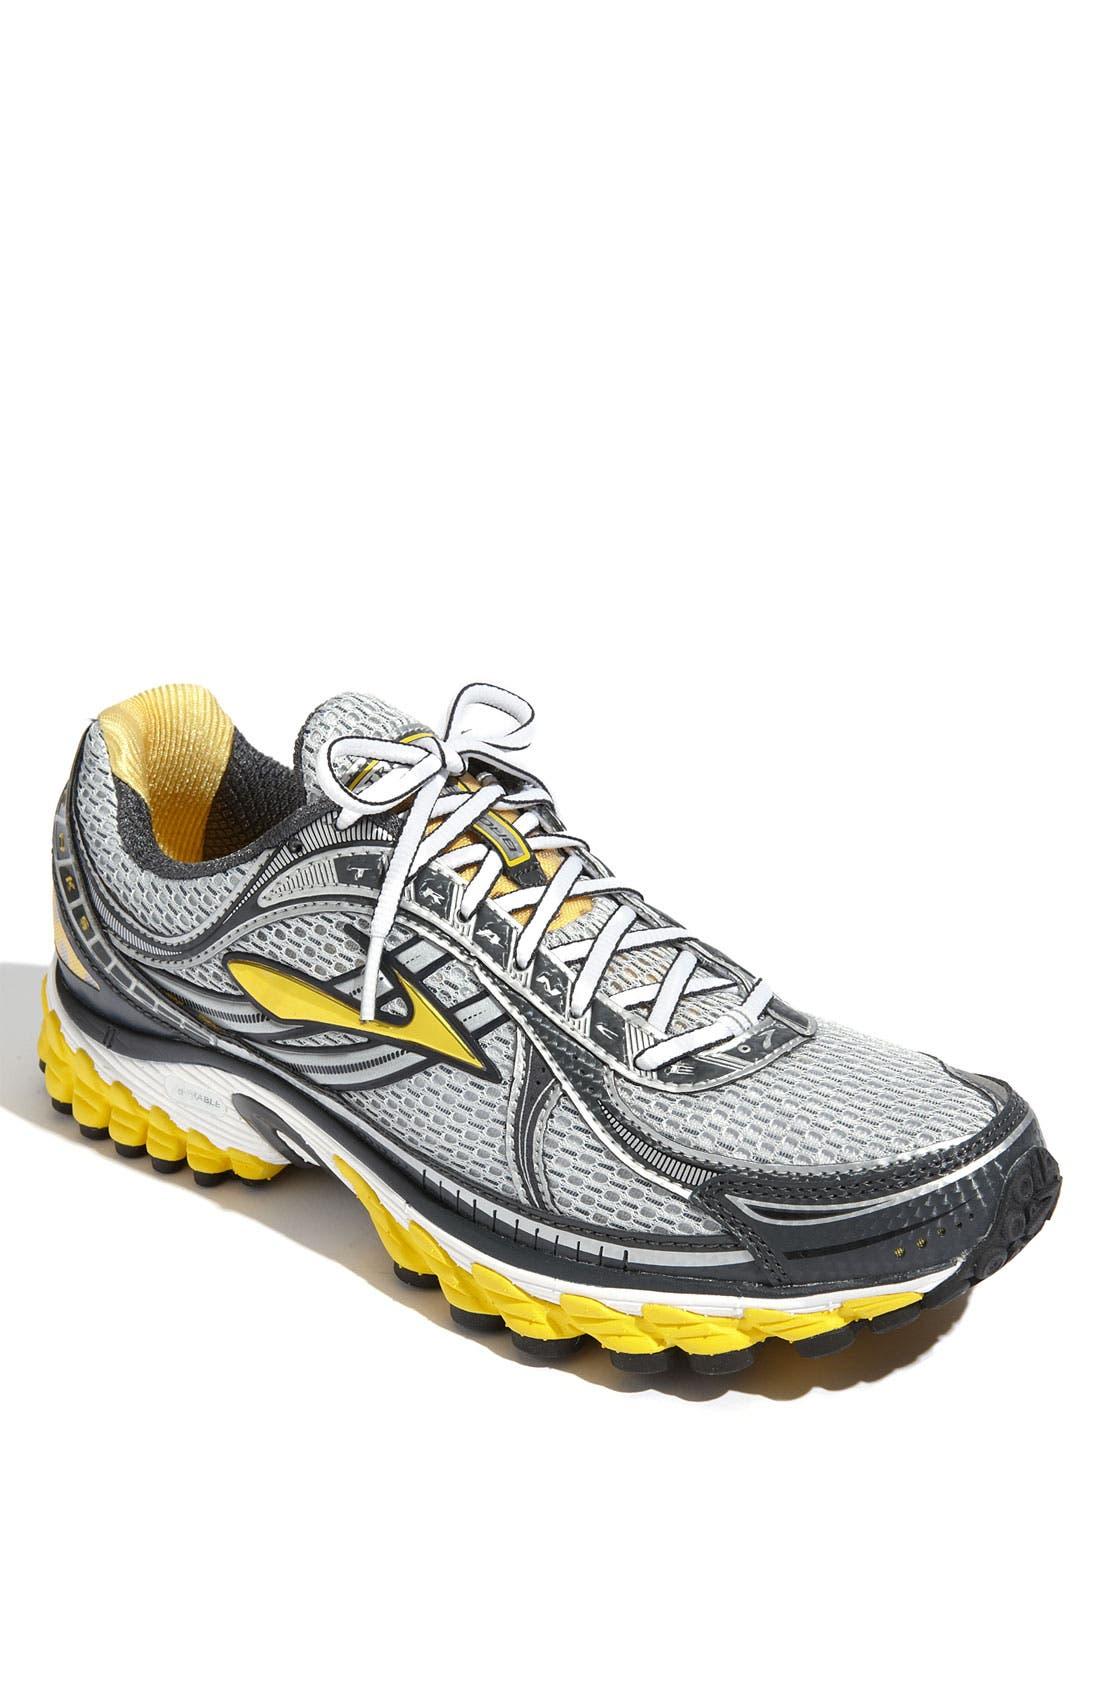 Main Image - Brooks 'Trance 11' Running Shoe (Men)